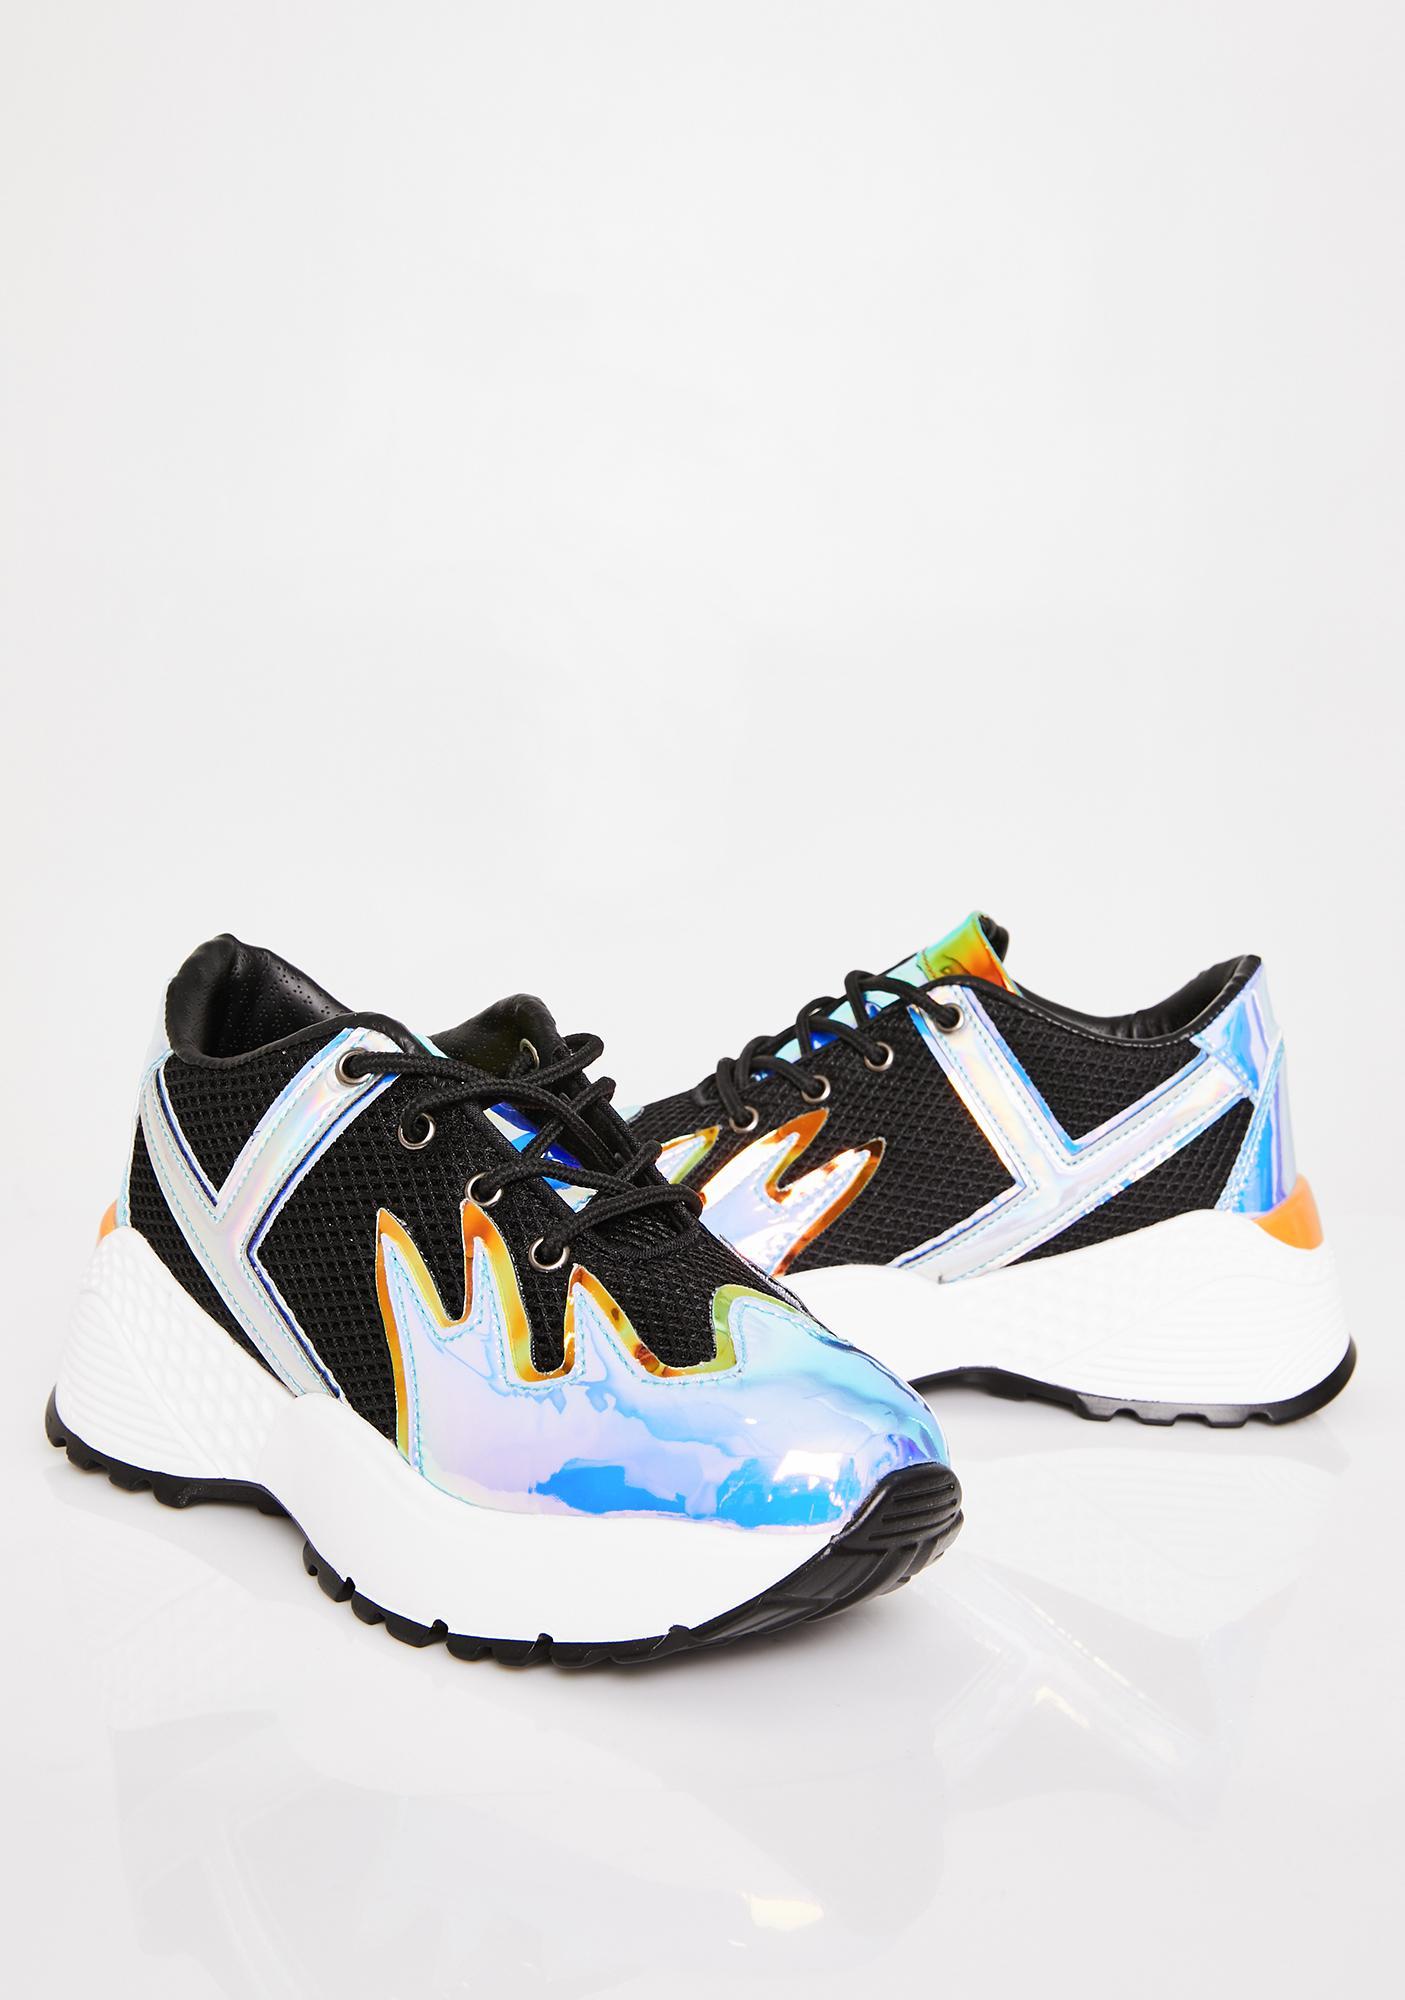 Y.R.U. Night Blaz3 Platform Sneakers